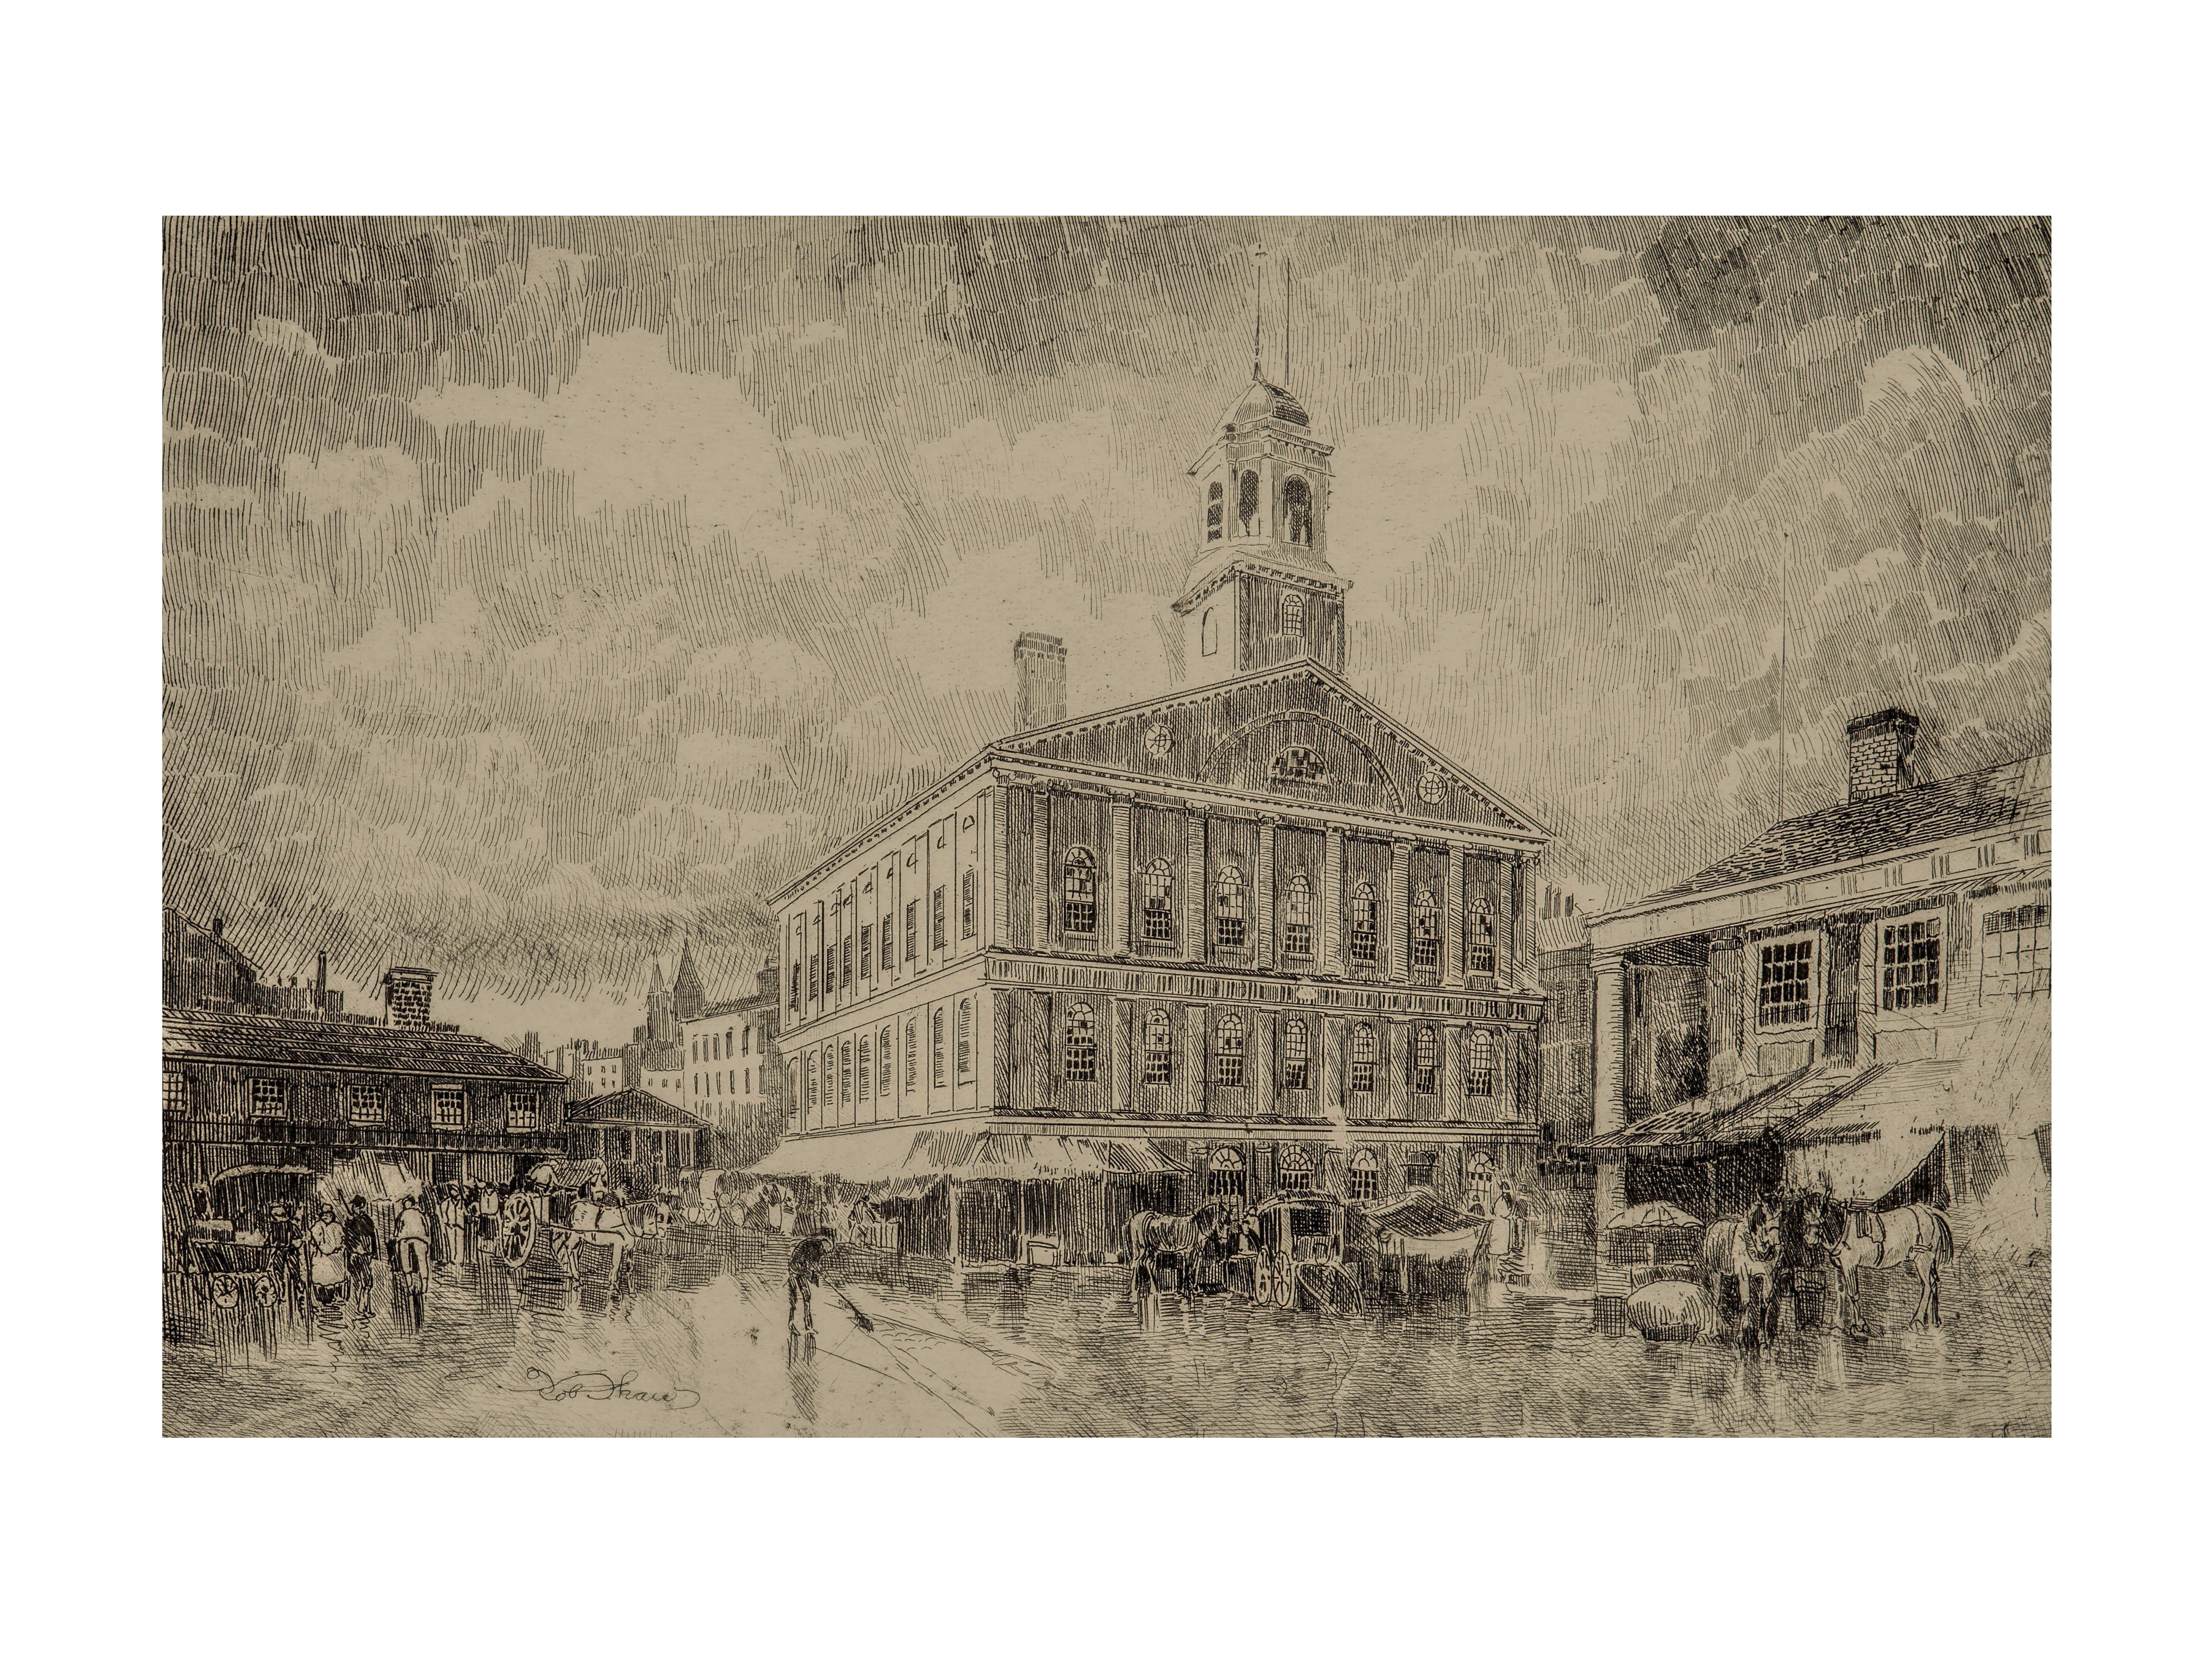 Robert Shaw Faneuil Hall Boston historical wall art print